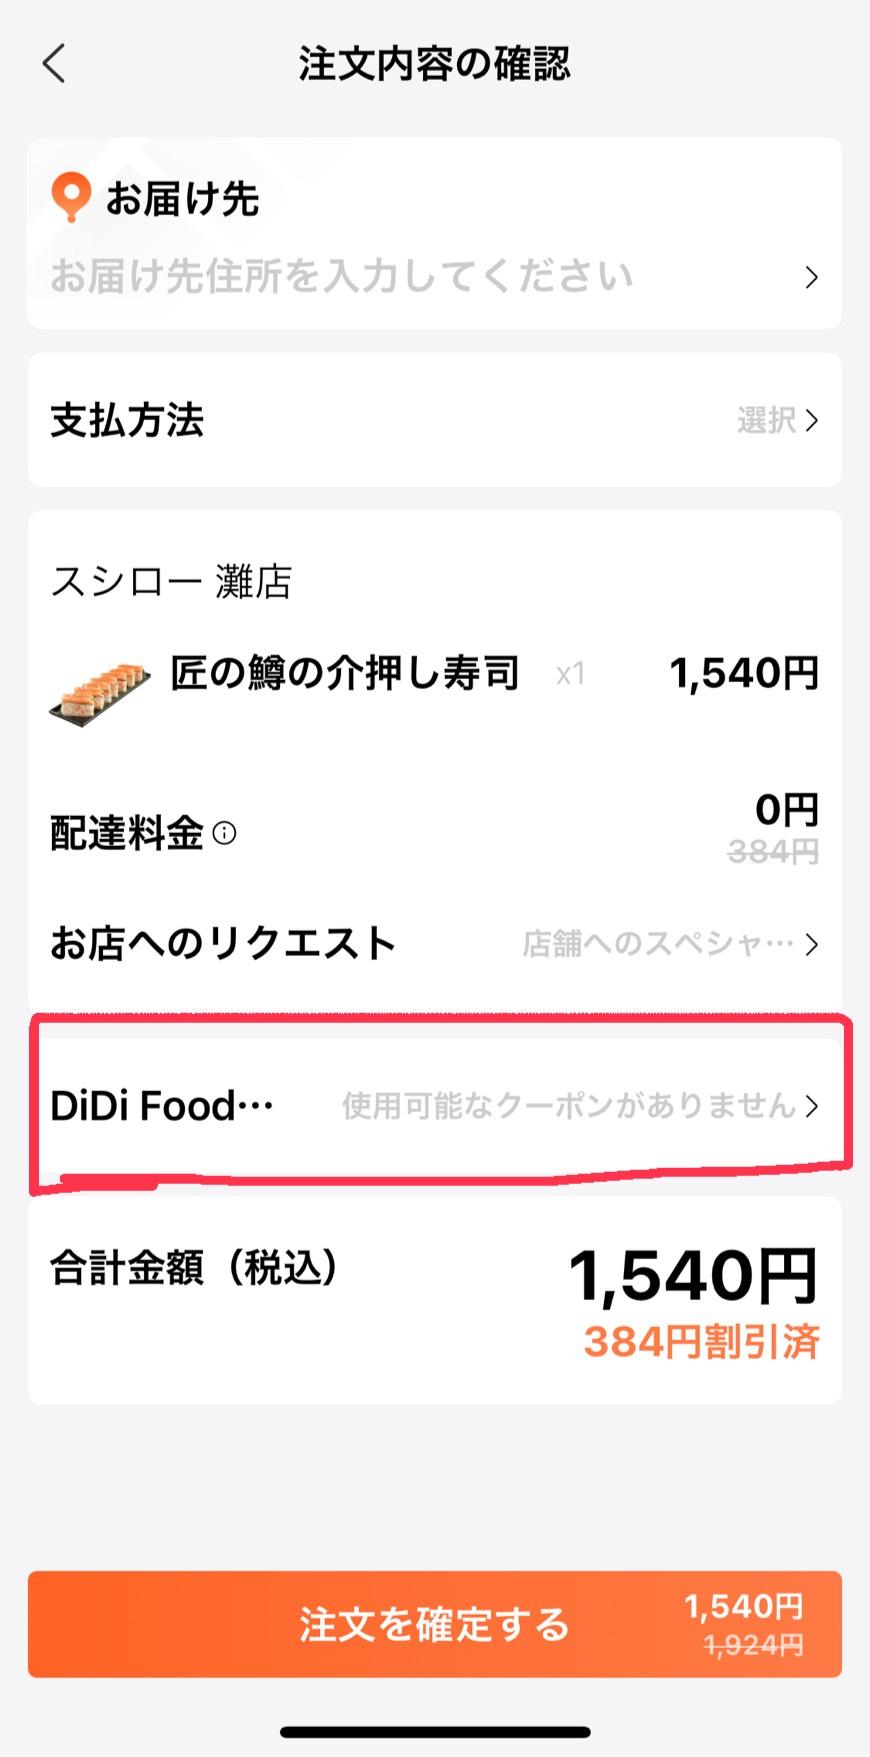 didiフードアプリイメージ1